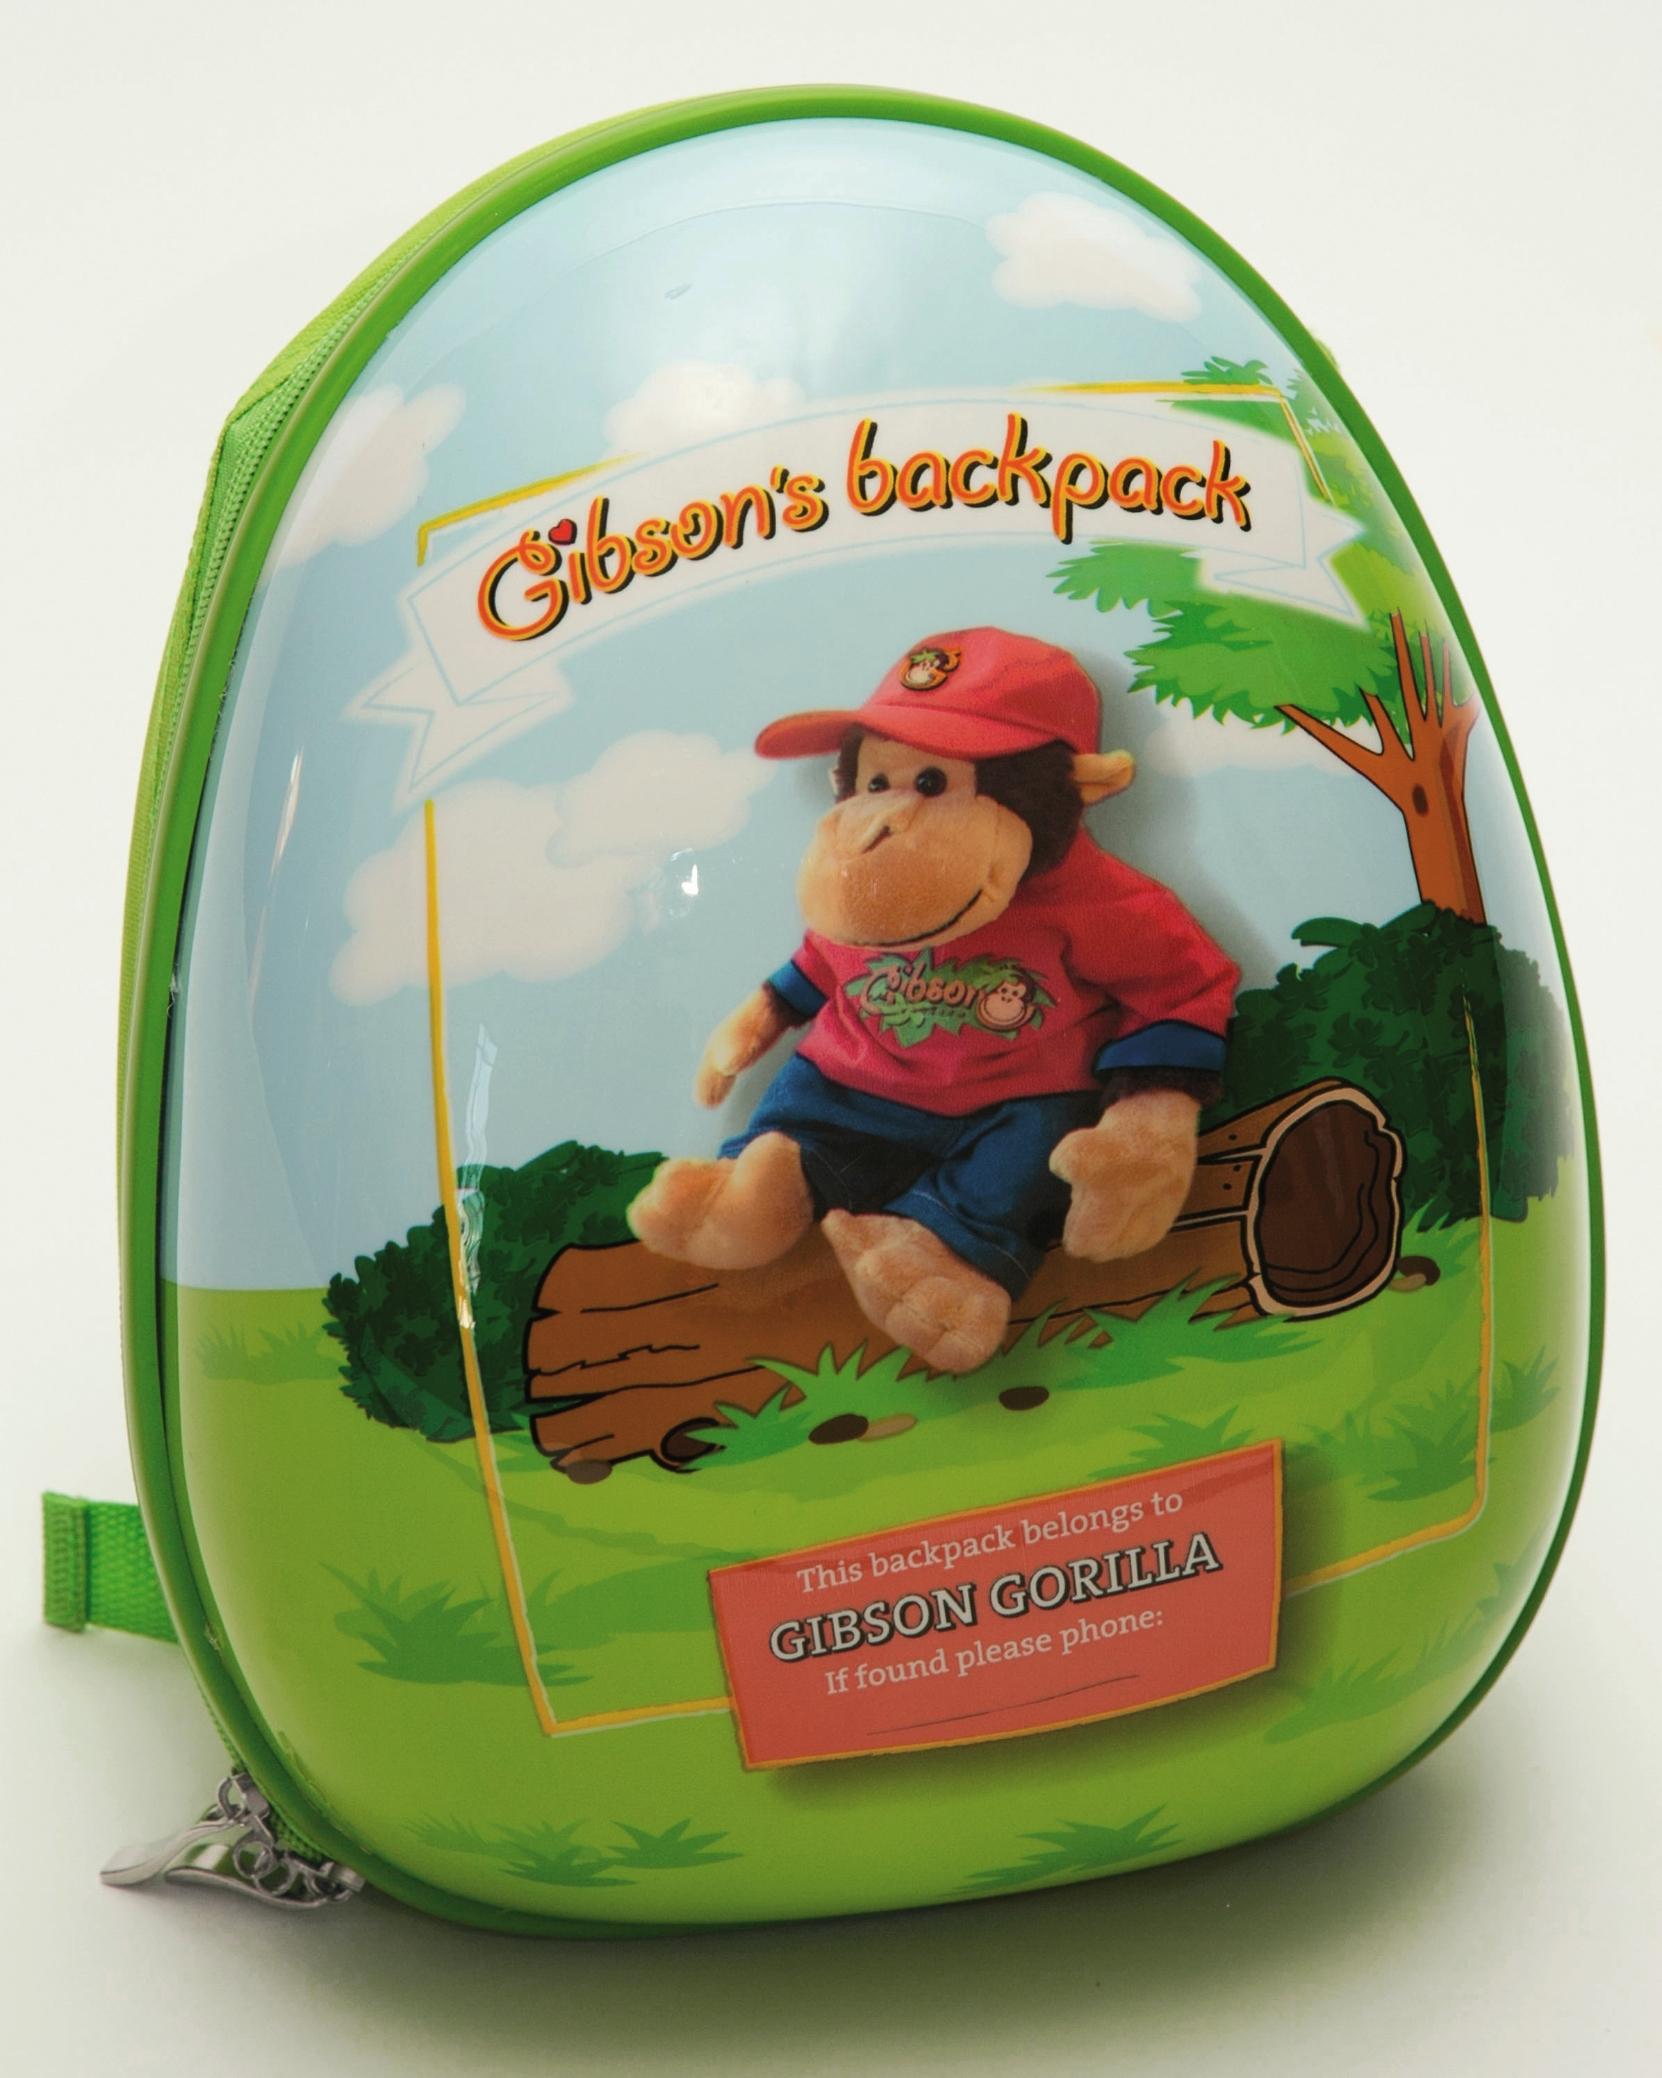 GG backpack closed.jpg